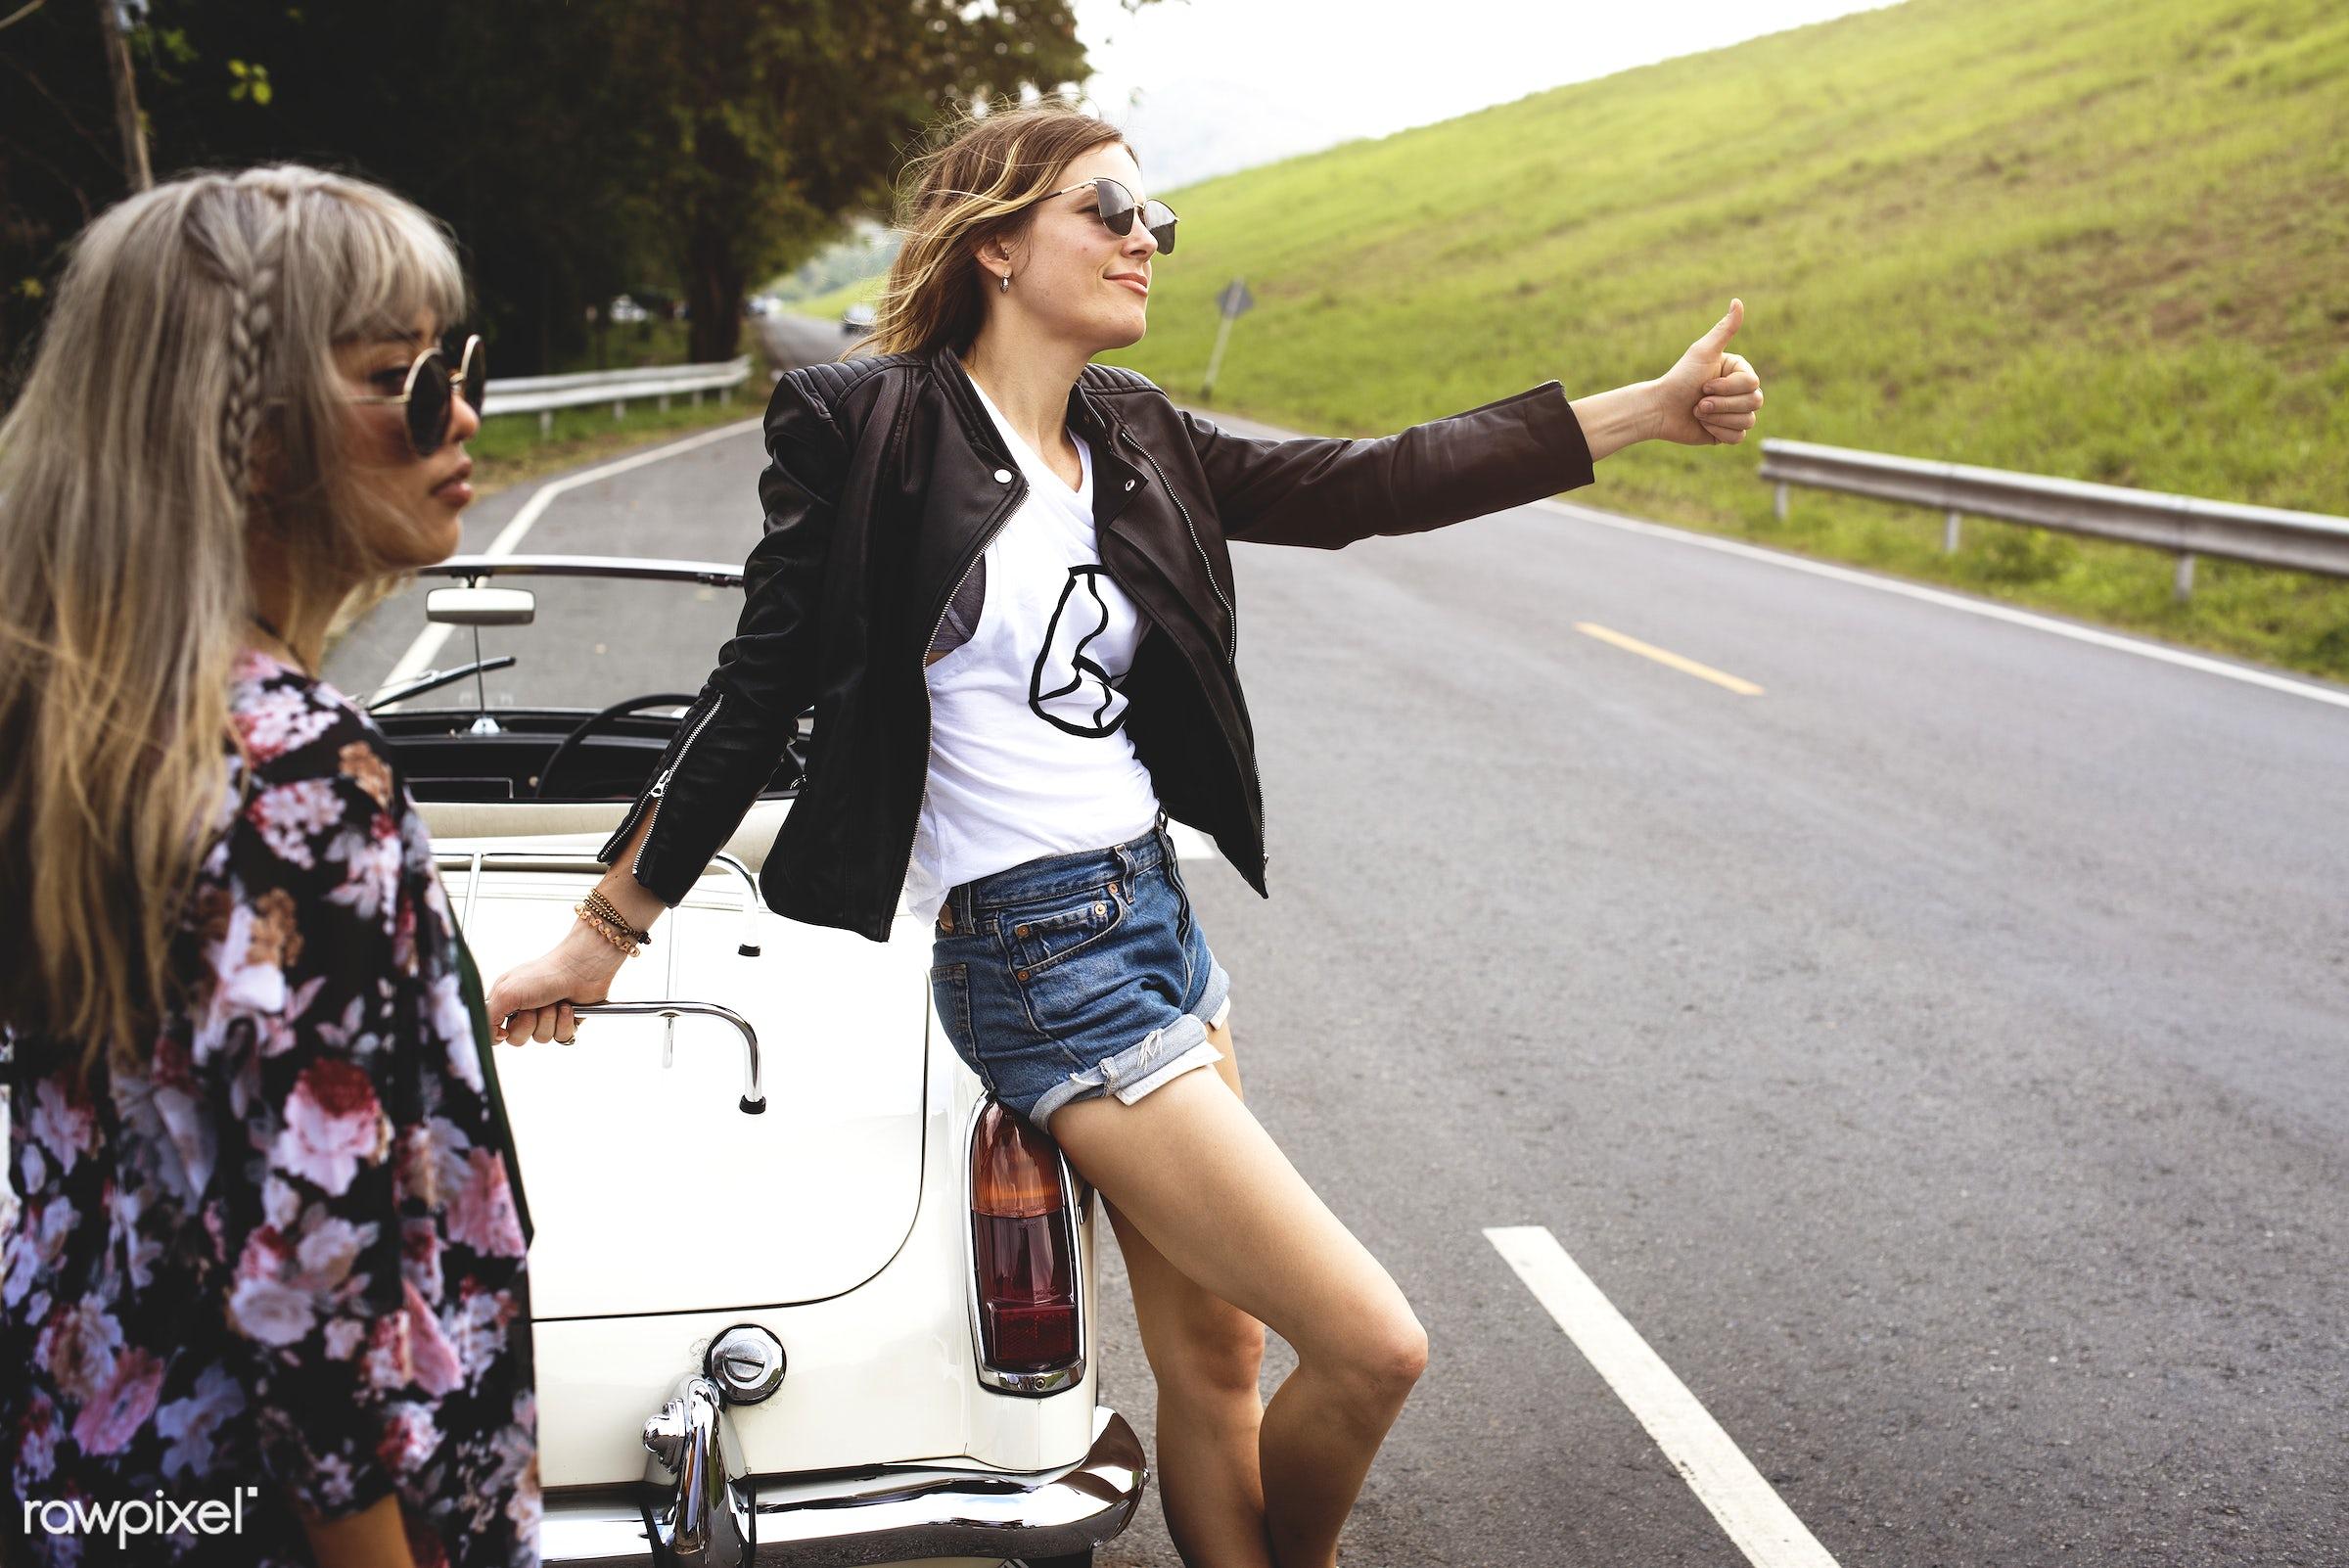 Diverse group of people enjoying a road trip and festival - street, adult, broke, car, comrade, confidant, confidante,...